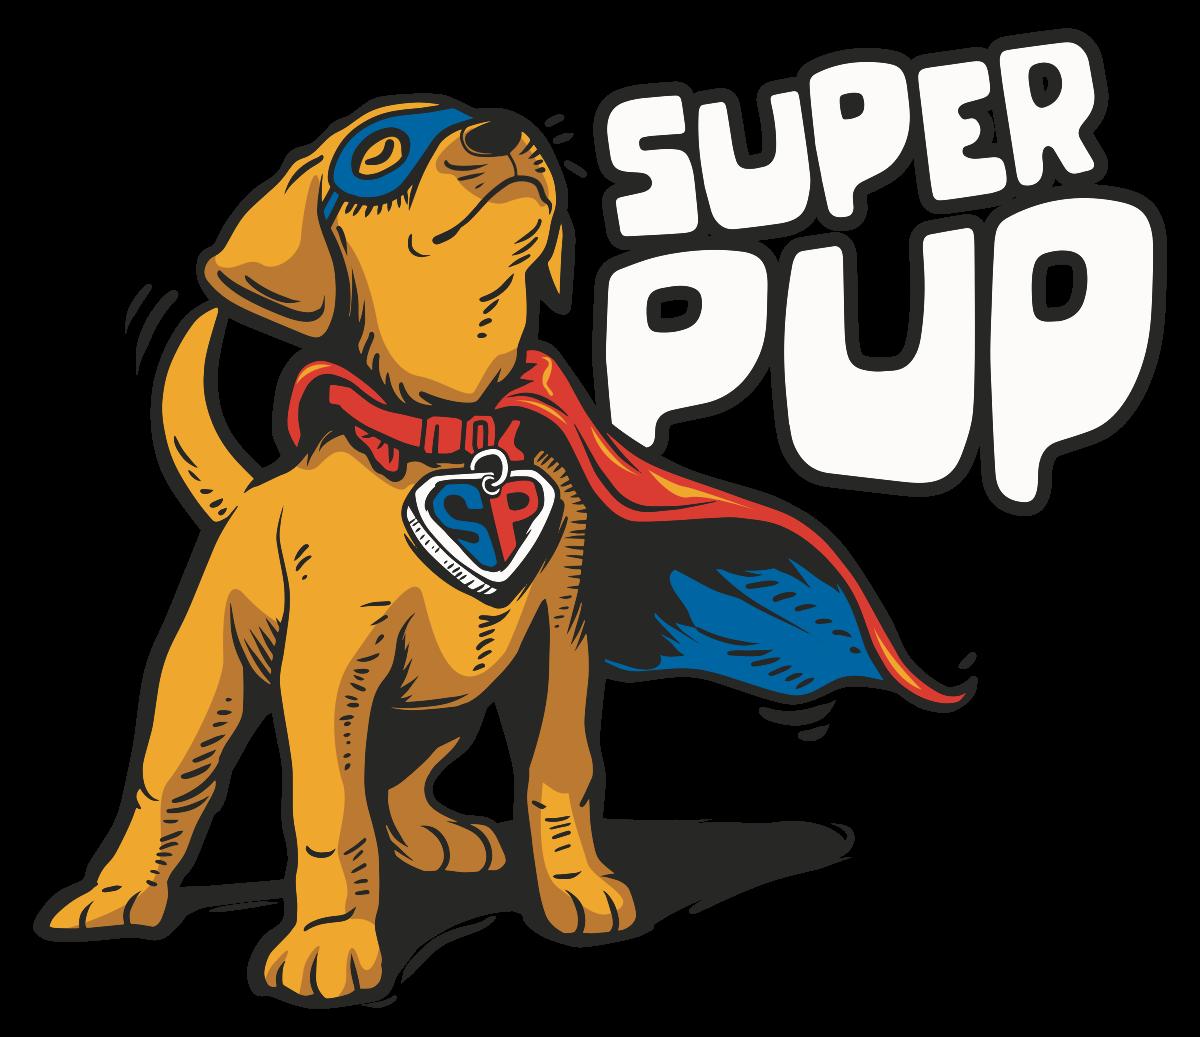 Cool puppy shirts!